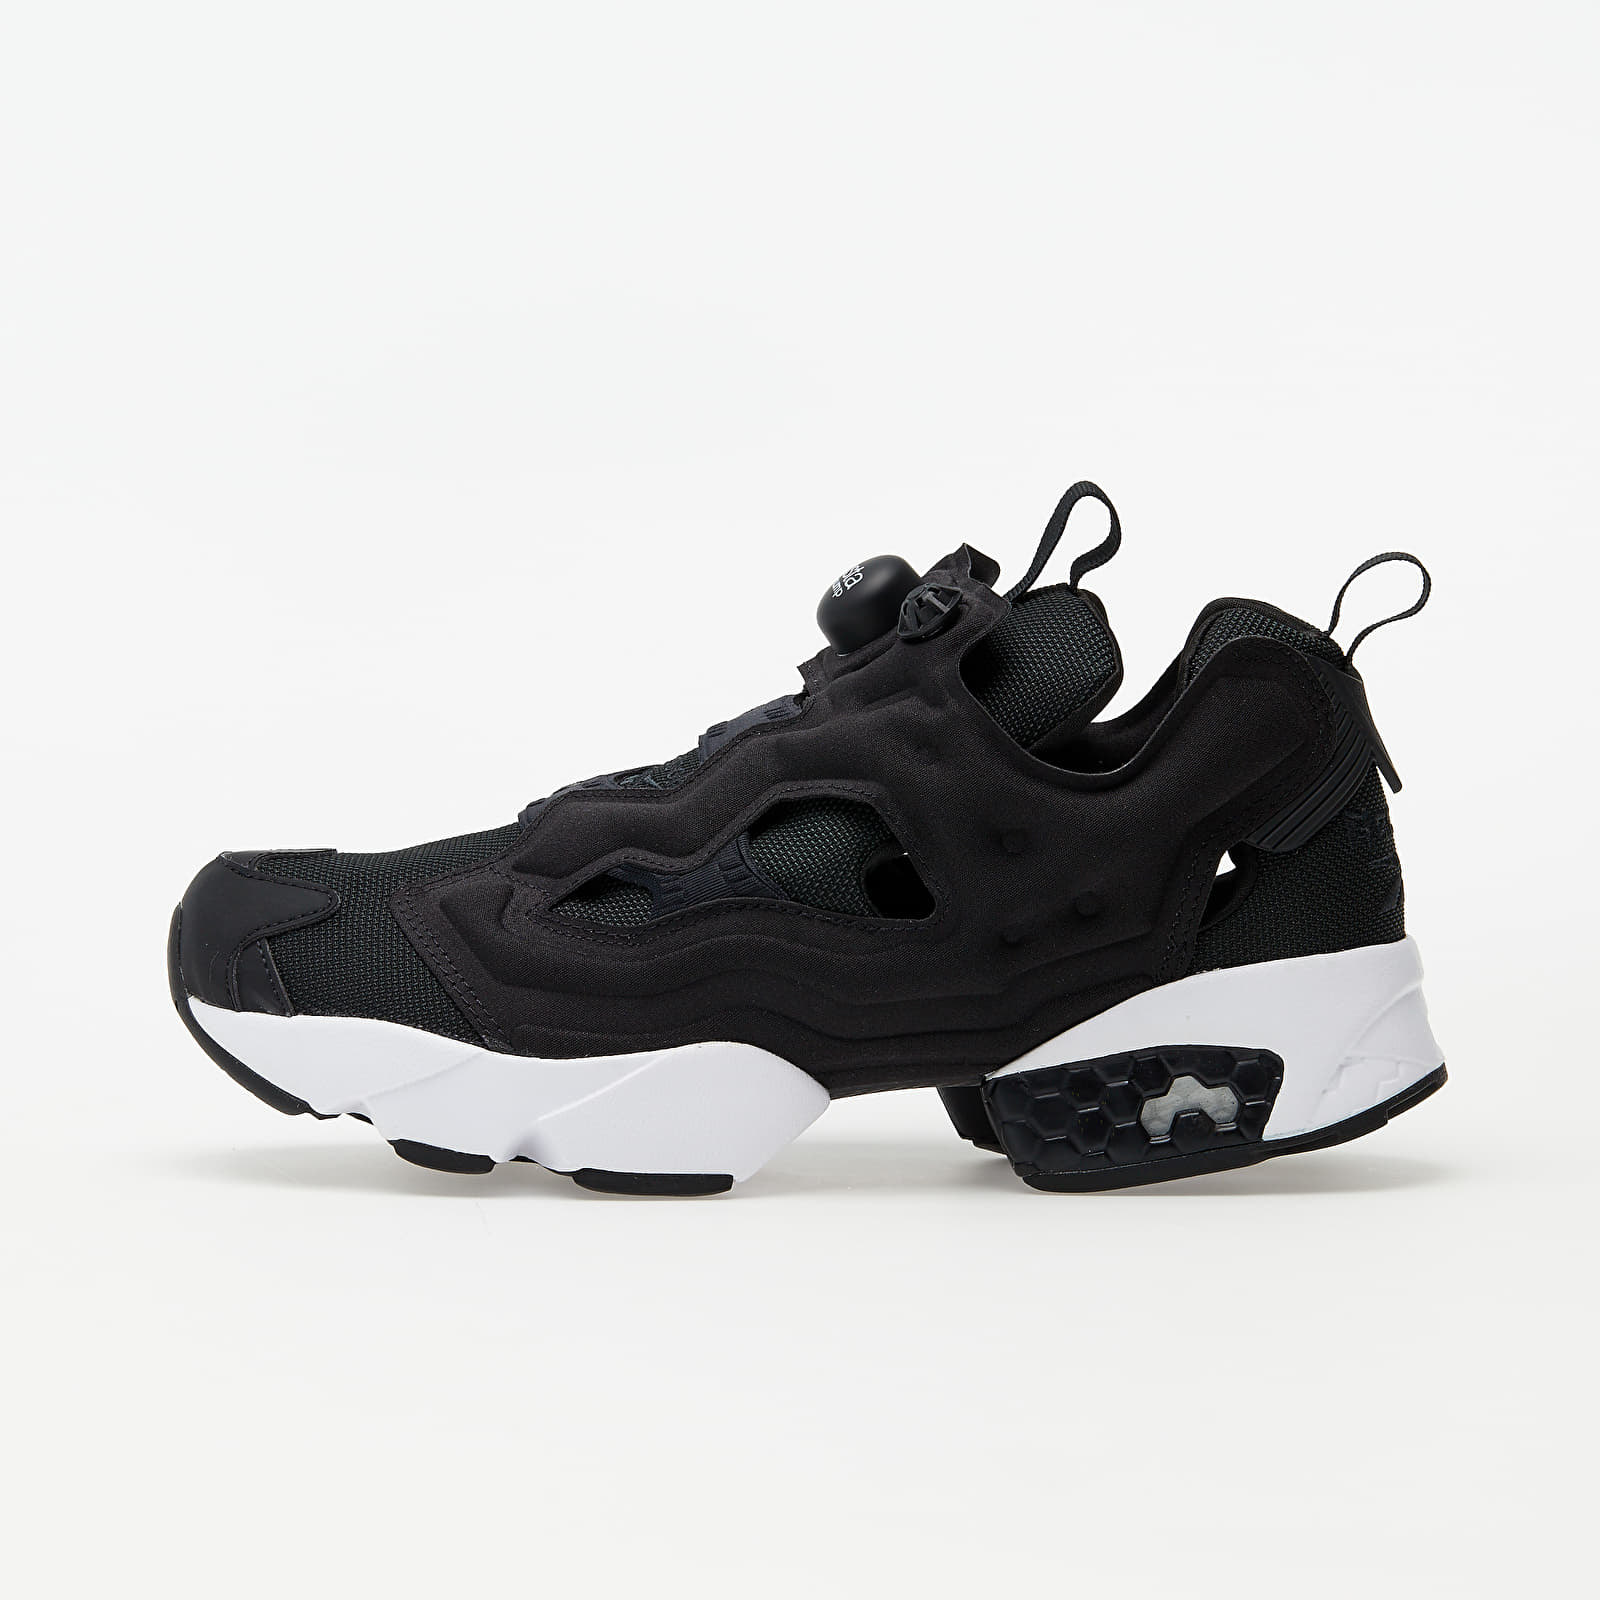 Men's shoes Reebok Instapump Fury OG M Black/ White